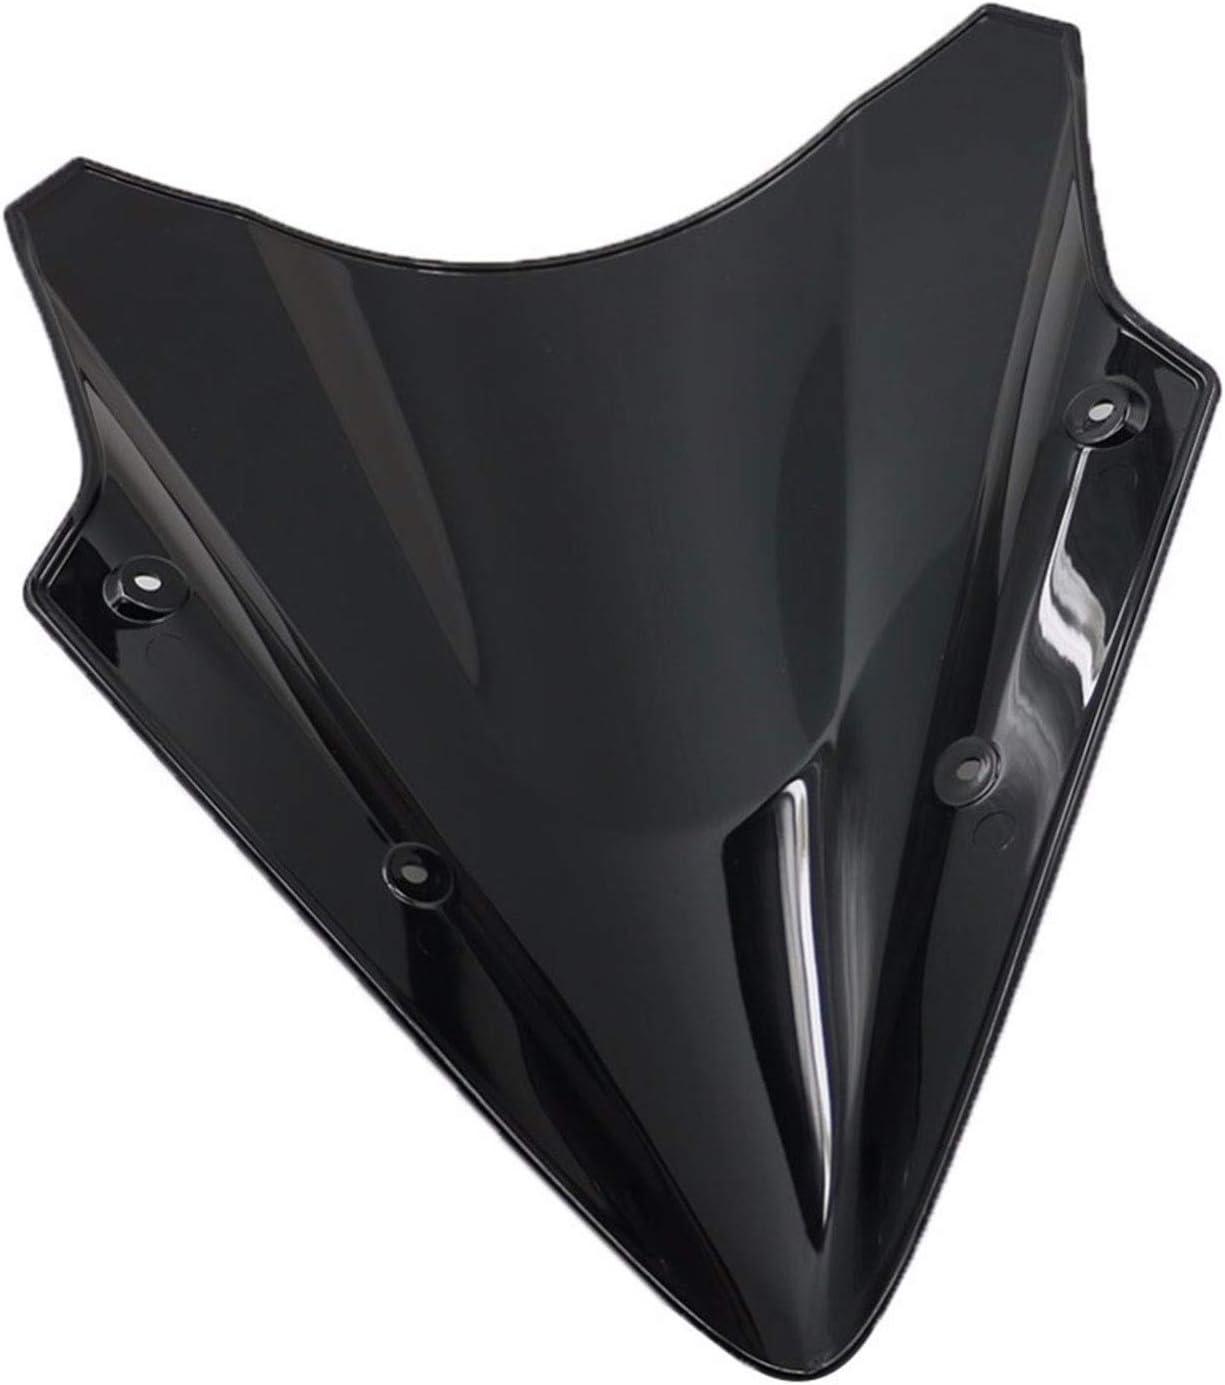 MDZZ Lowest price challenge Motorcycle Black Windscreen cheap Windshield for Nin Kawasaki Fit